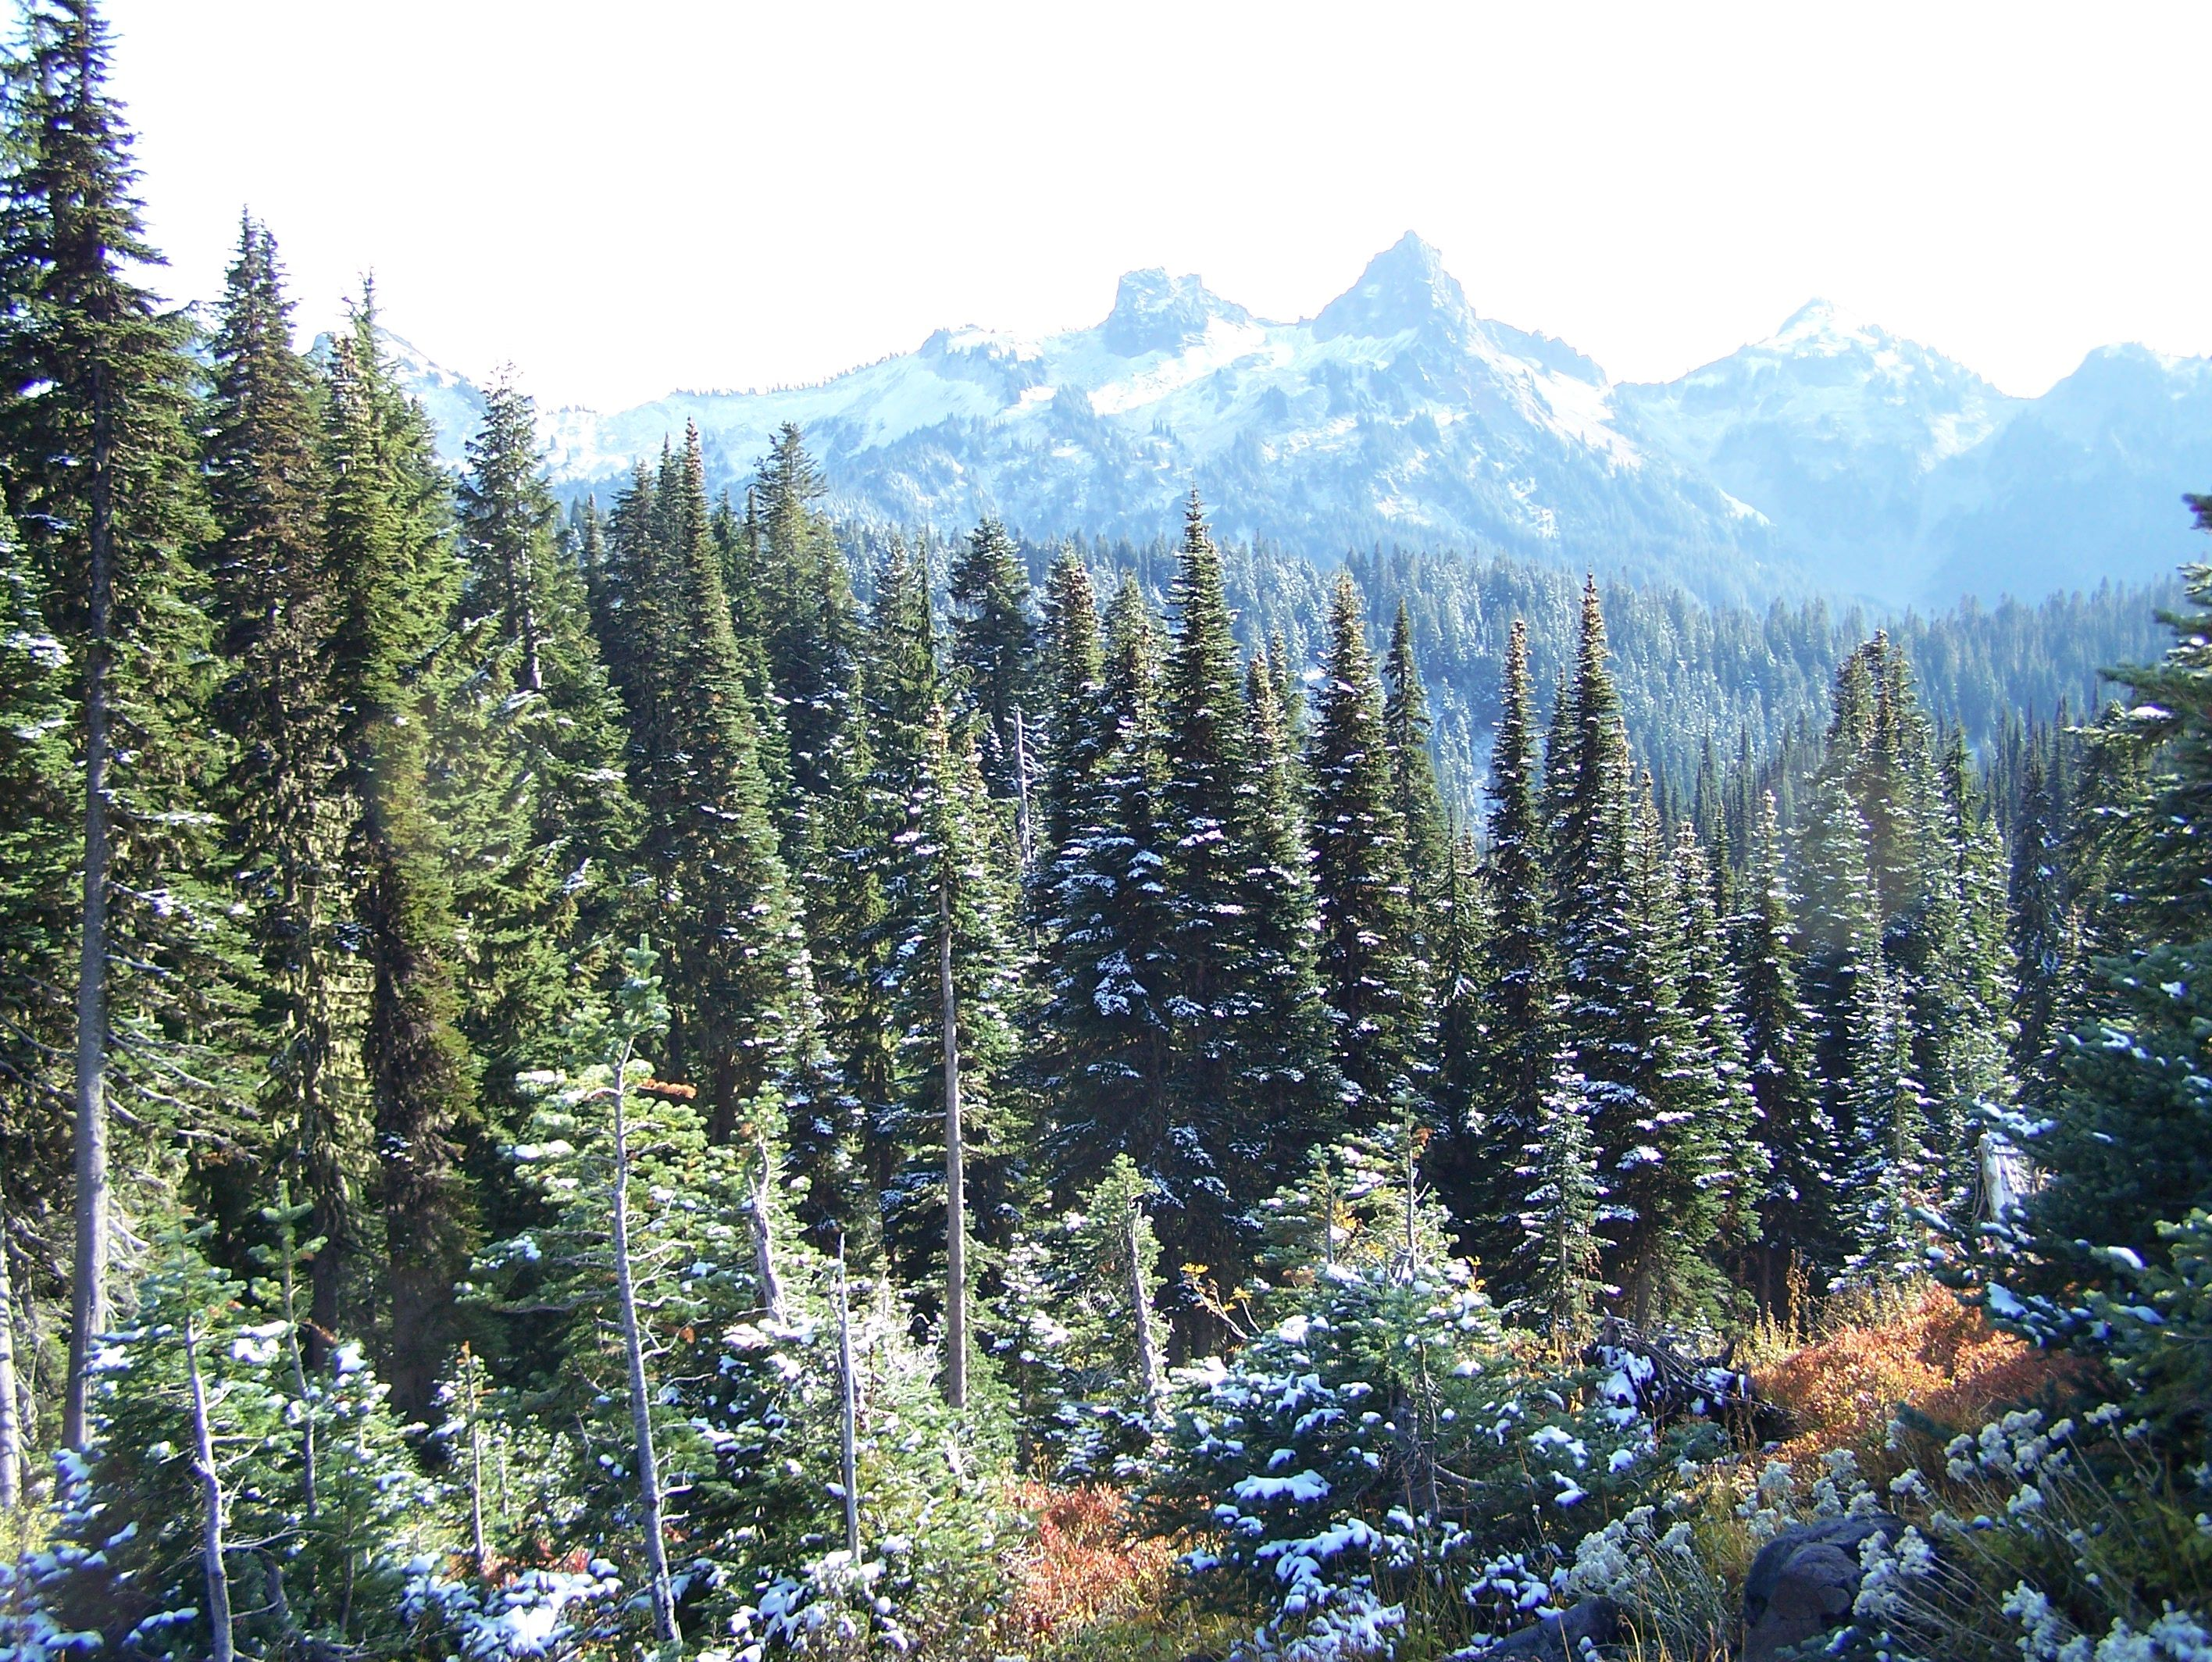 Snow in Paradise, Mt. Rainier - Washington